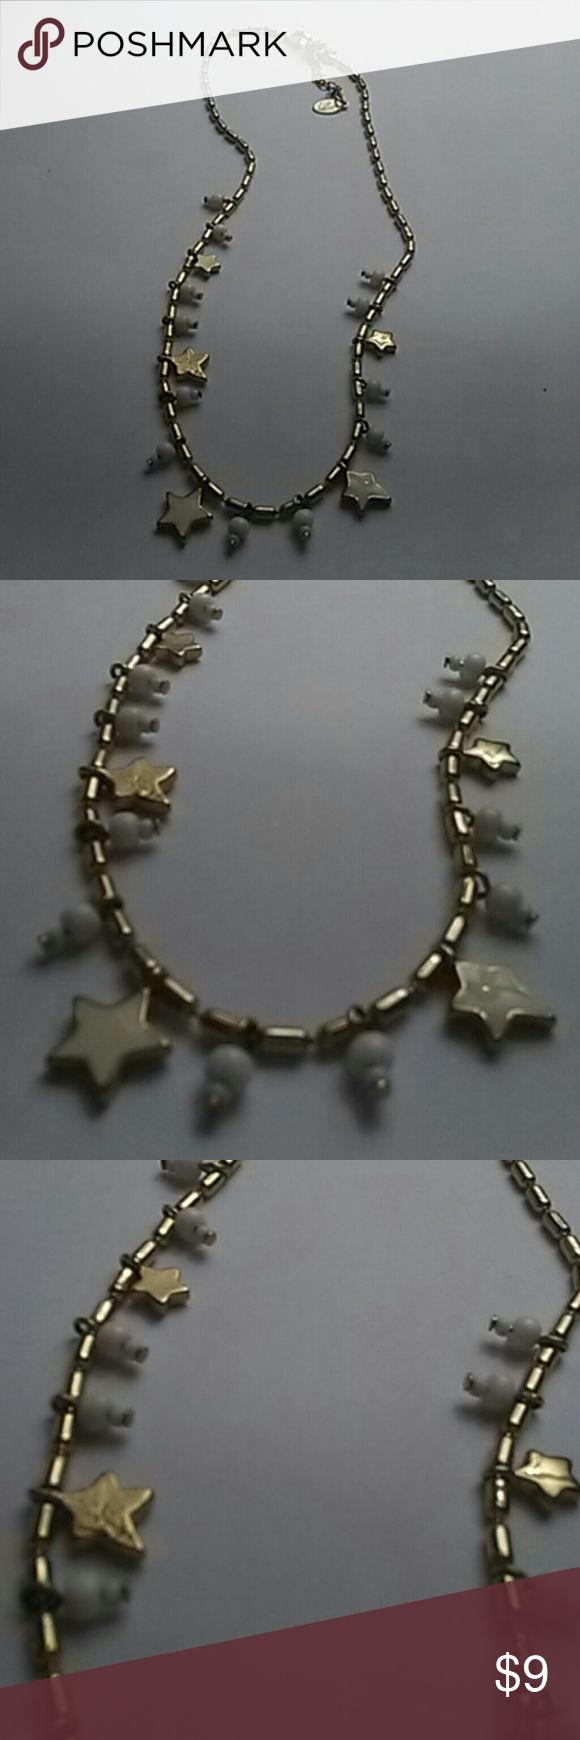 Liz Claiborne Star Charm Necklace Liz Claiborne Star Charm Necklace with Goldtone dangling stars and dangling white beads Liz Claiborne Jewelry Necklaces